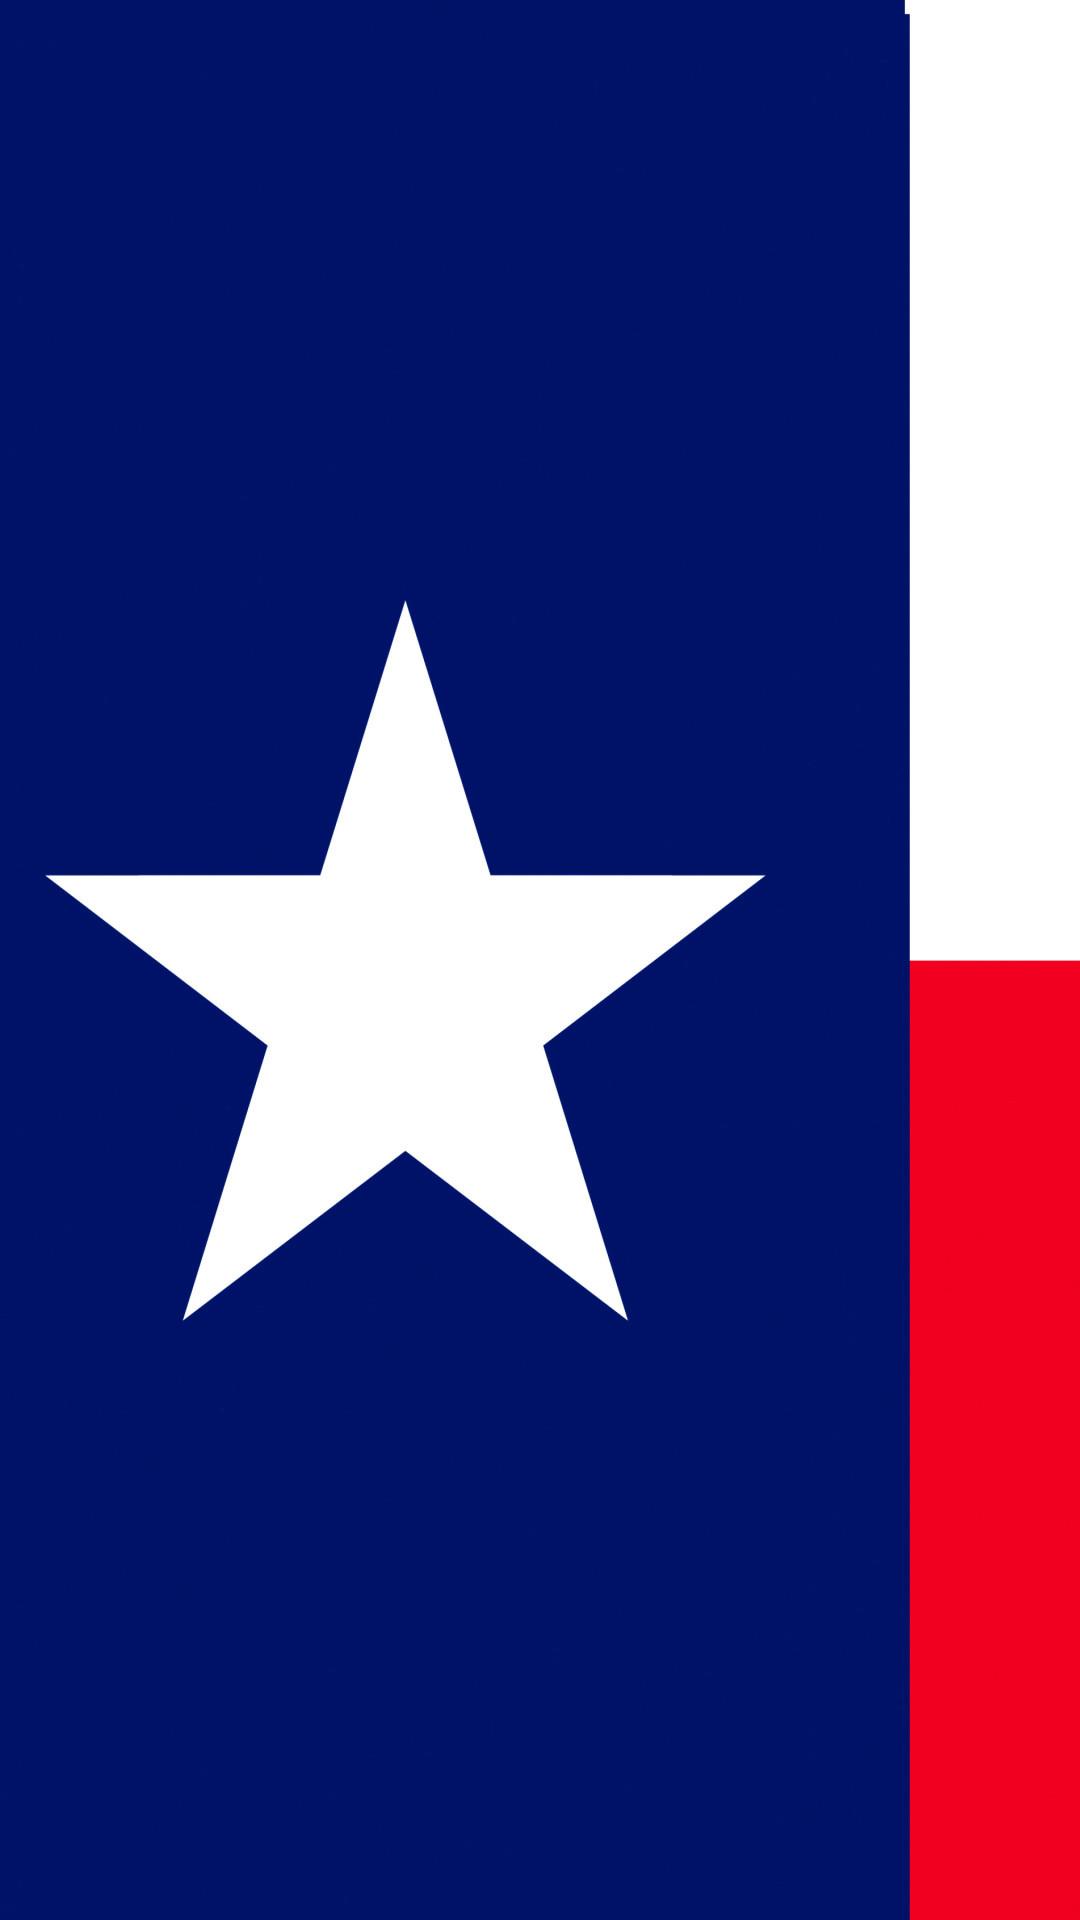 Usa texas flag iphone 6 hd photos